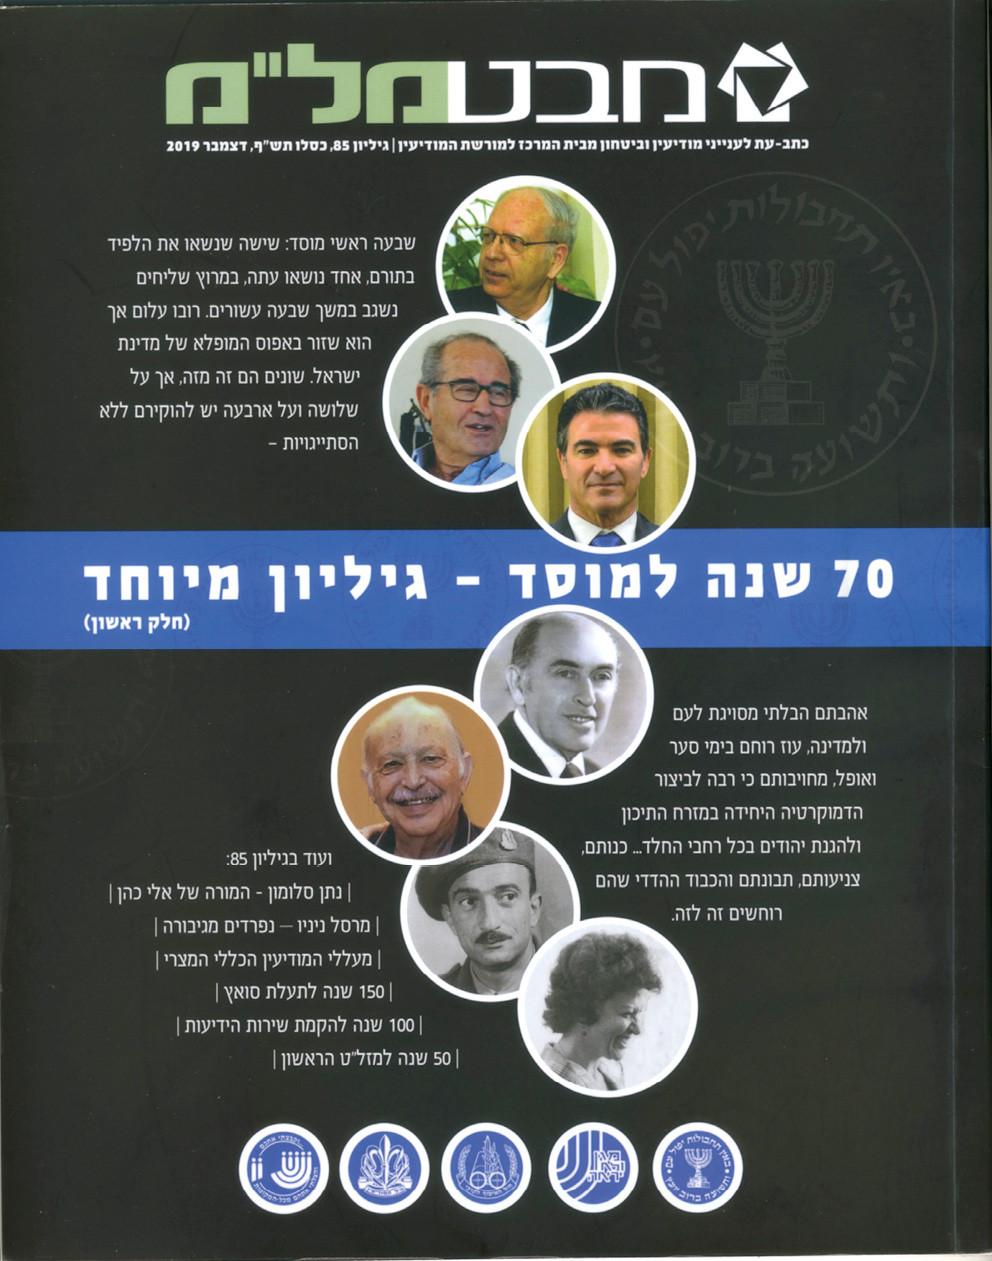 כתב העת לענייני מודיעין וביטחון